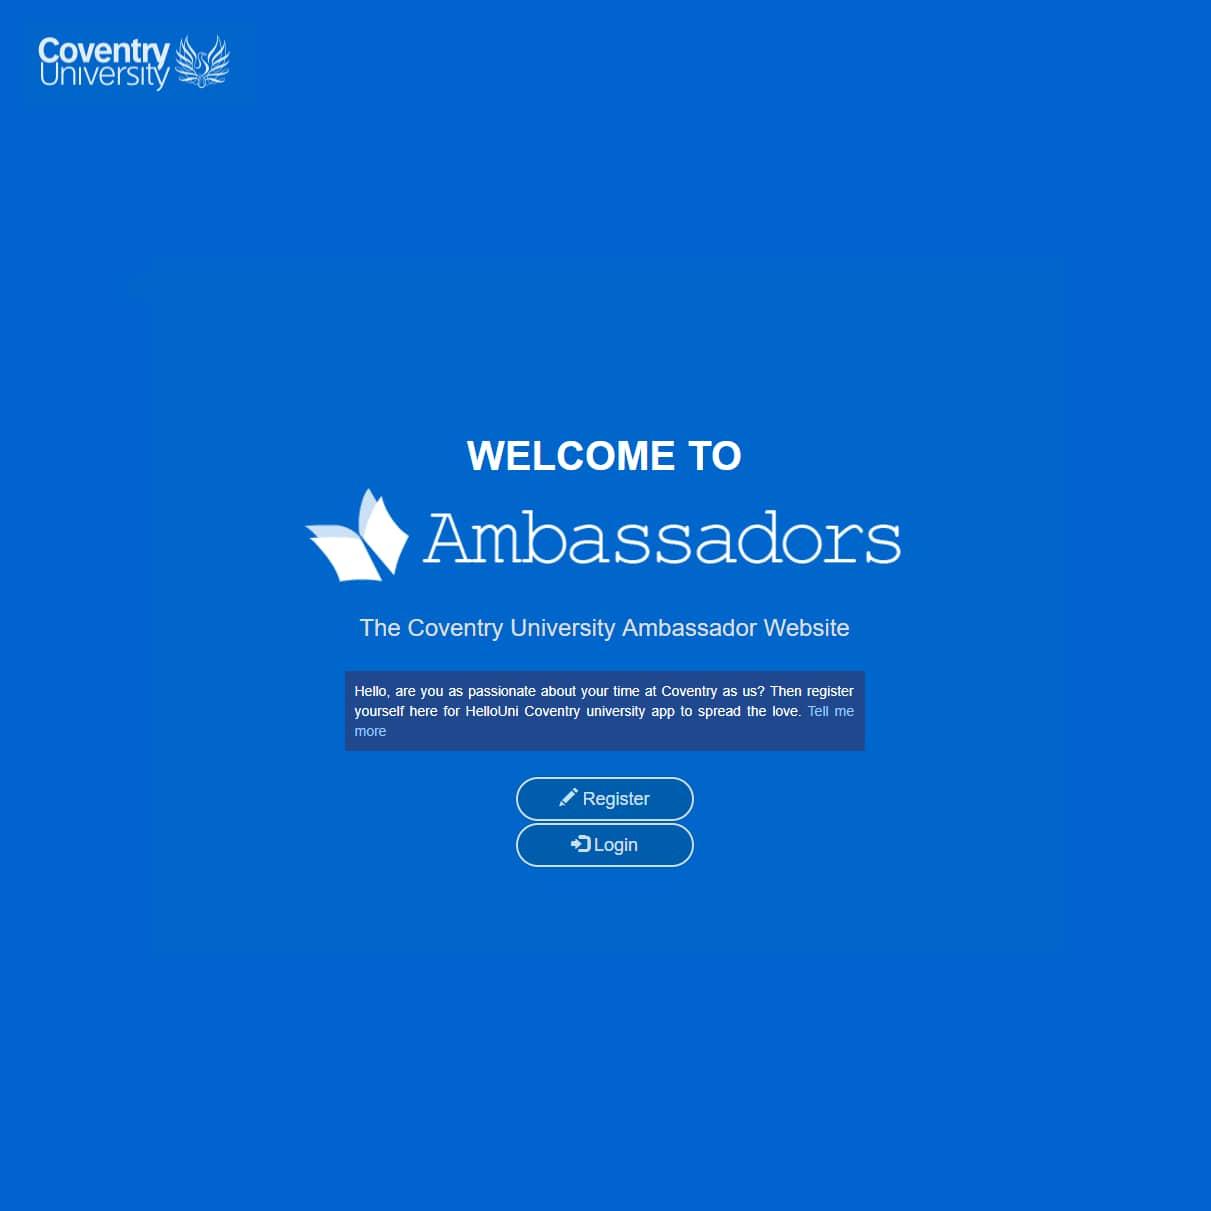 HelloCoventry Ambassadors